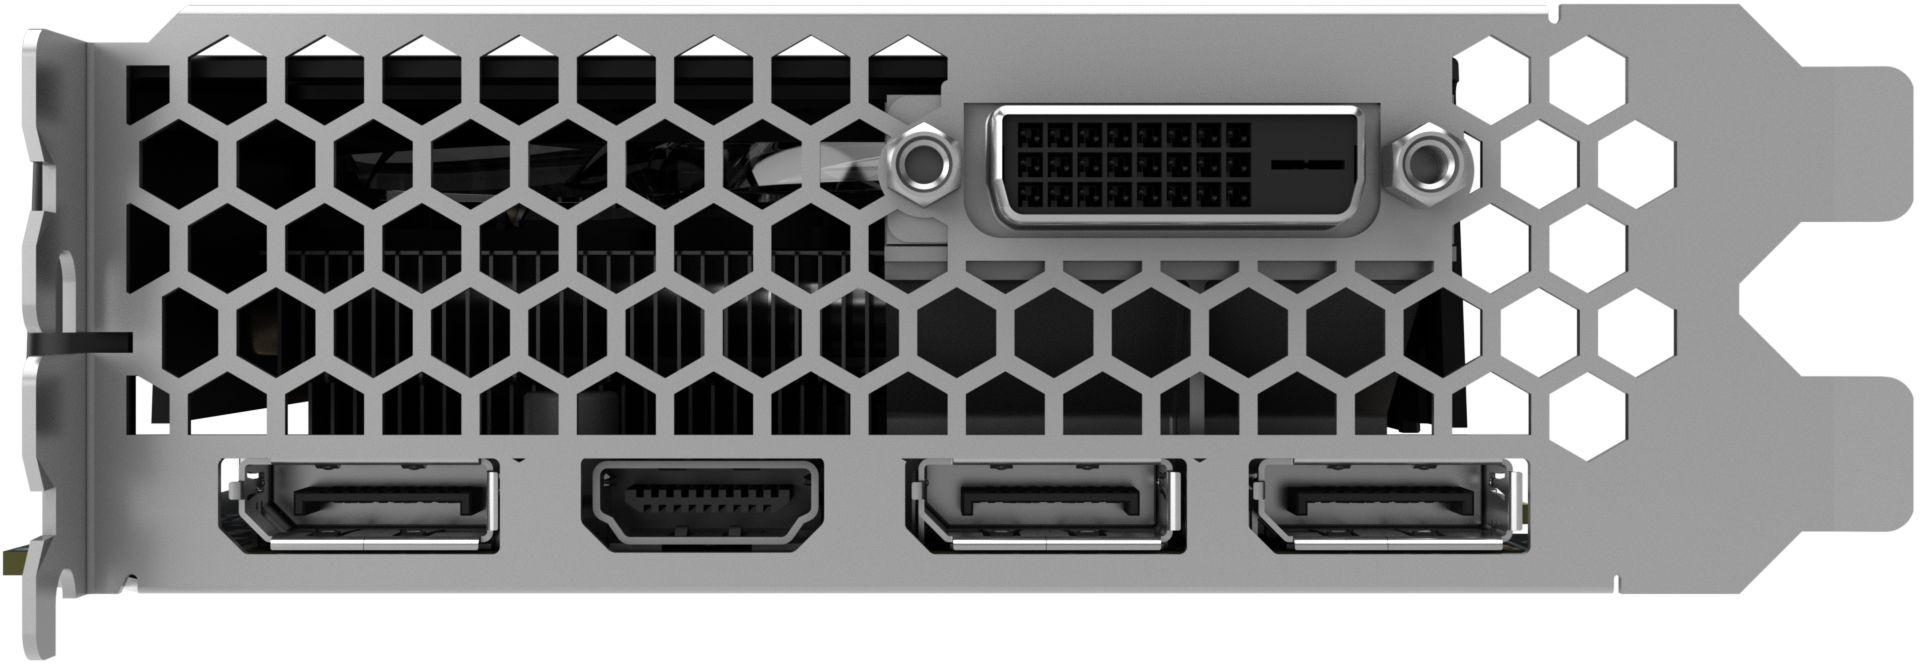 GeForce GTX 1070 Ti 8GB DUAL Graphics Card, NE5107T015P2-1043D